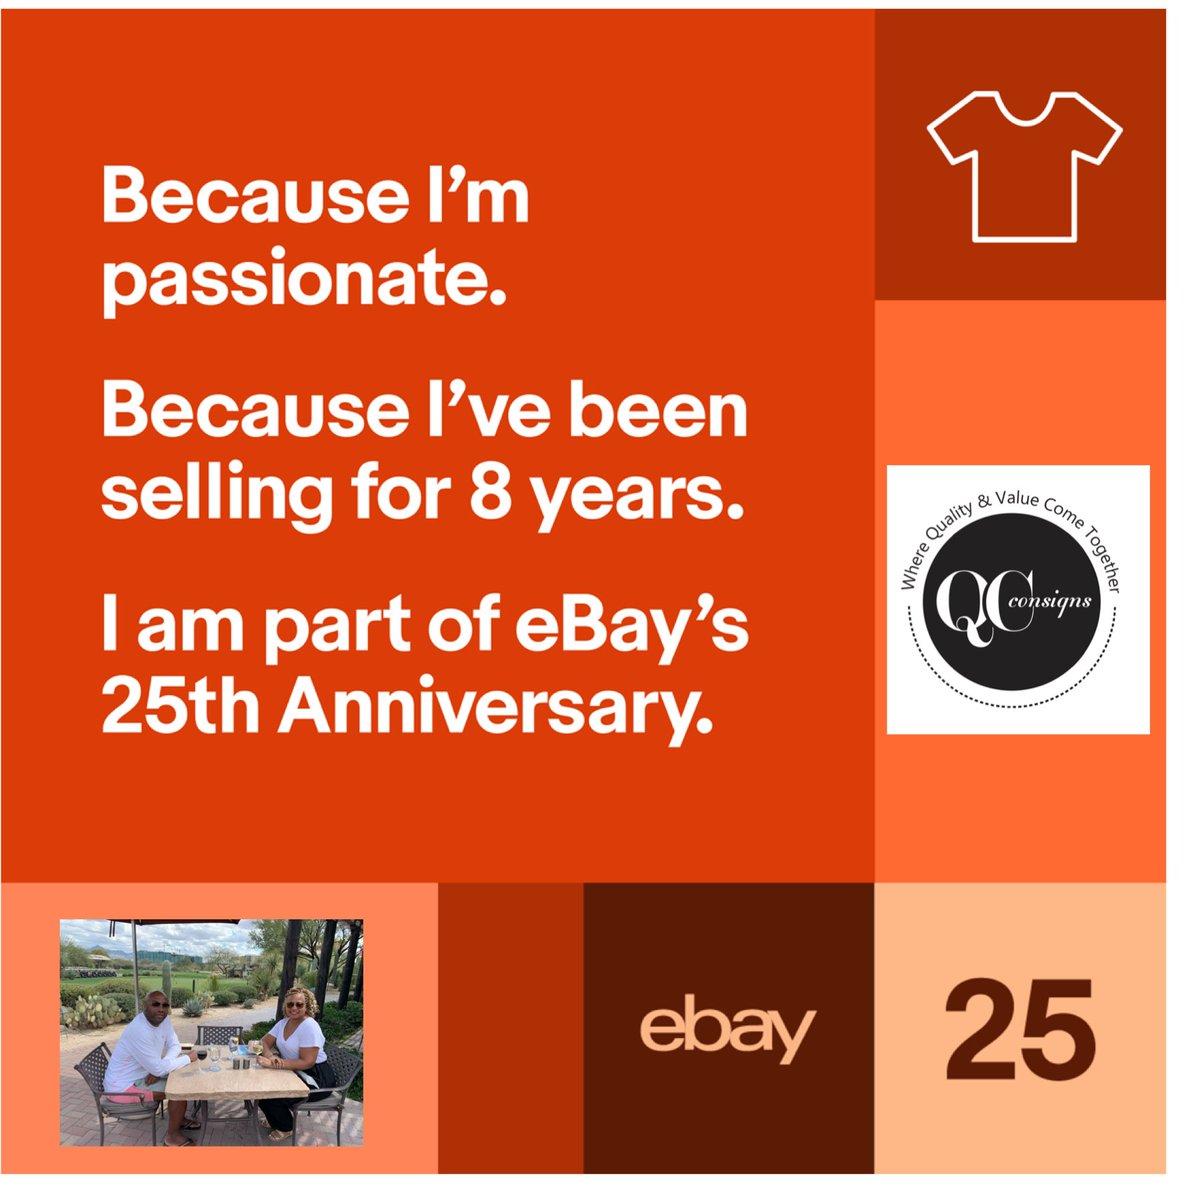 Ebay25 Hashtag On Twitter